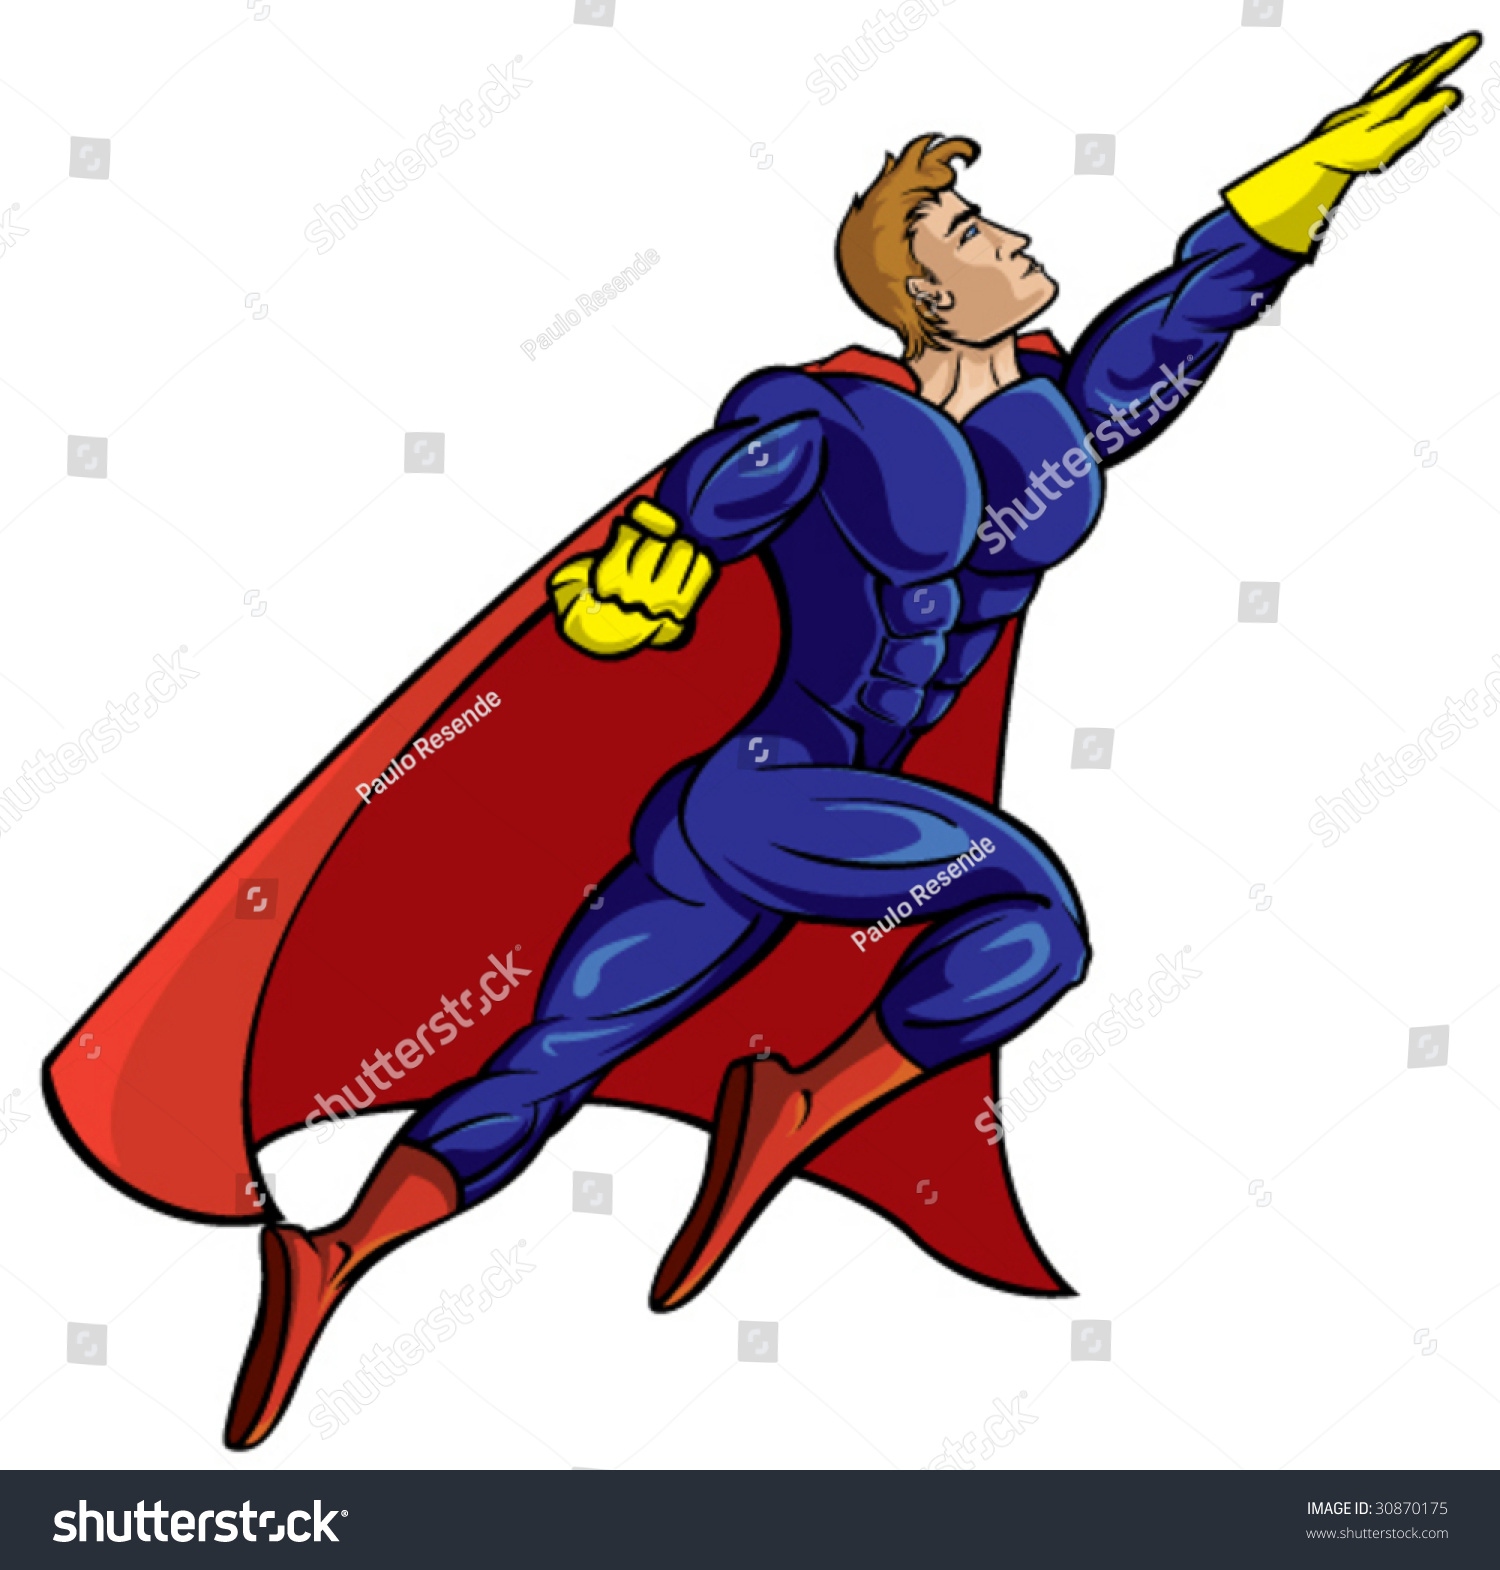 Super Hero Flying - Vector Illustration - 30870175 : Shutterstock Superhero Flying Vector